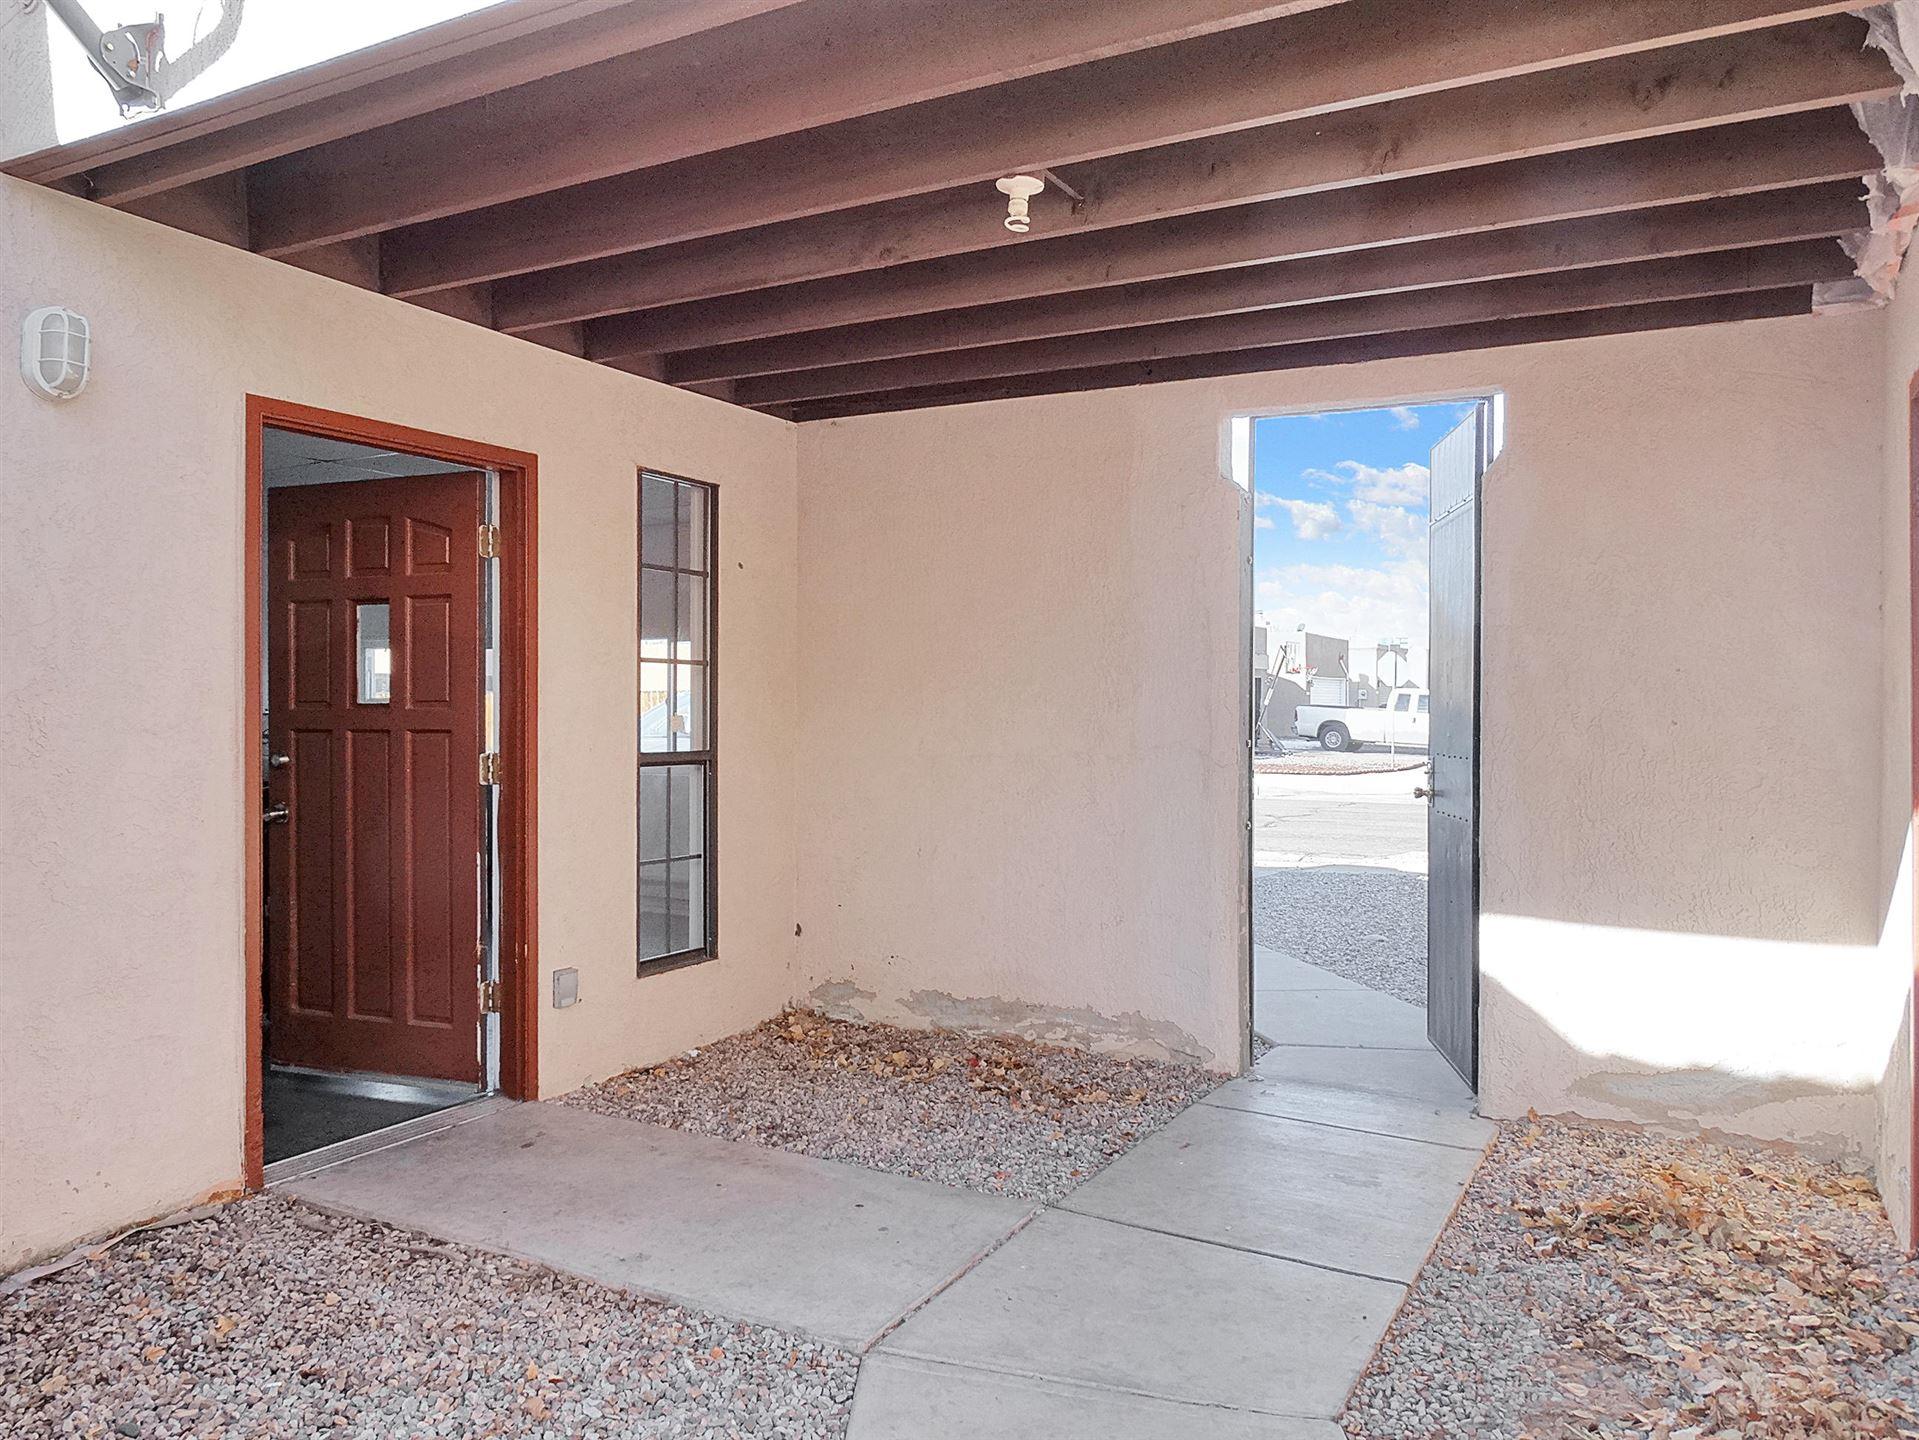 Photo of 4024 67TH Street NW, Albuquerque, NM 87120 (MLS # 986259)